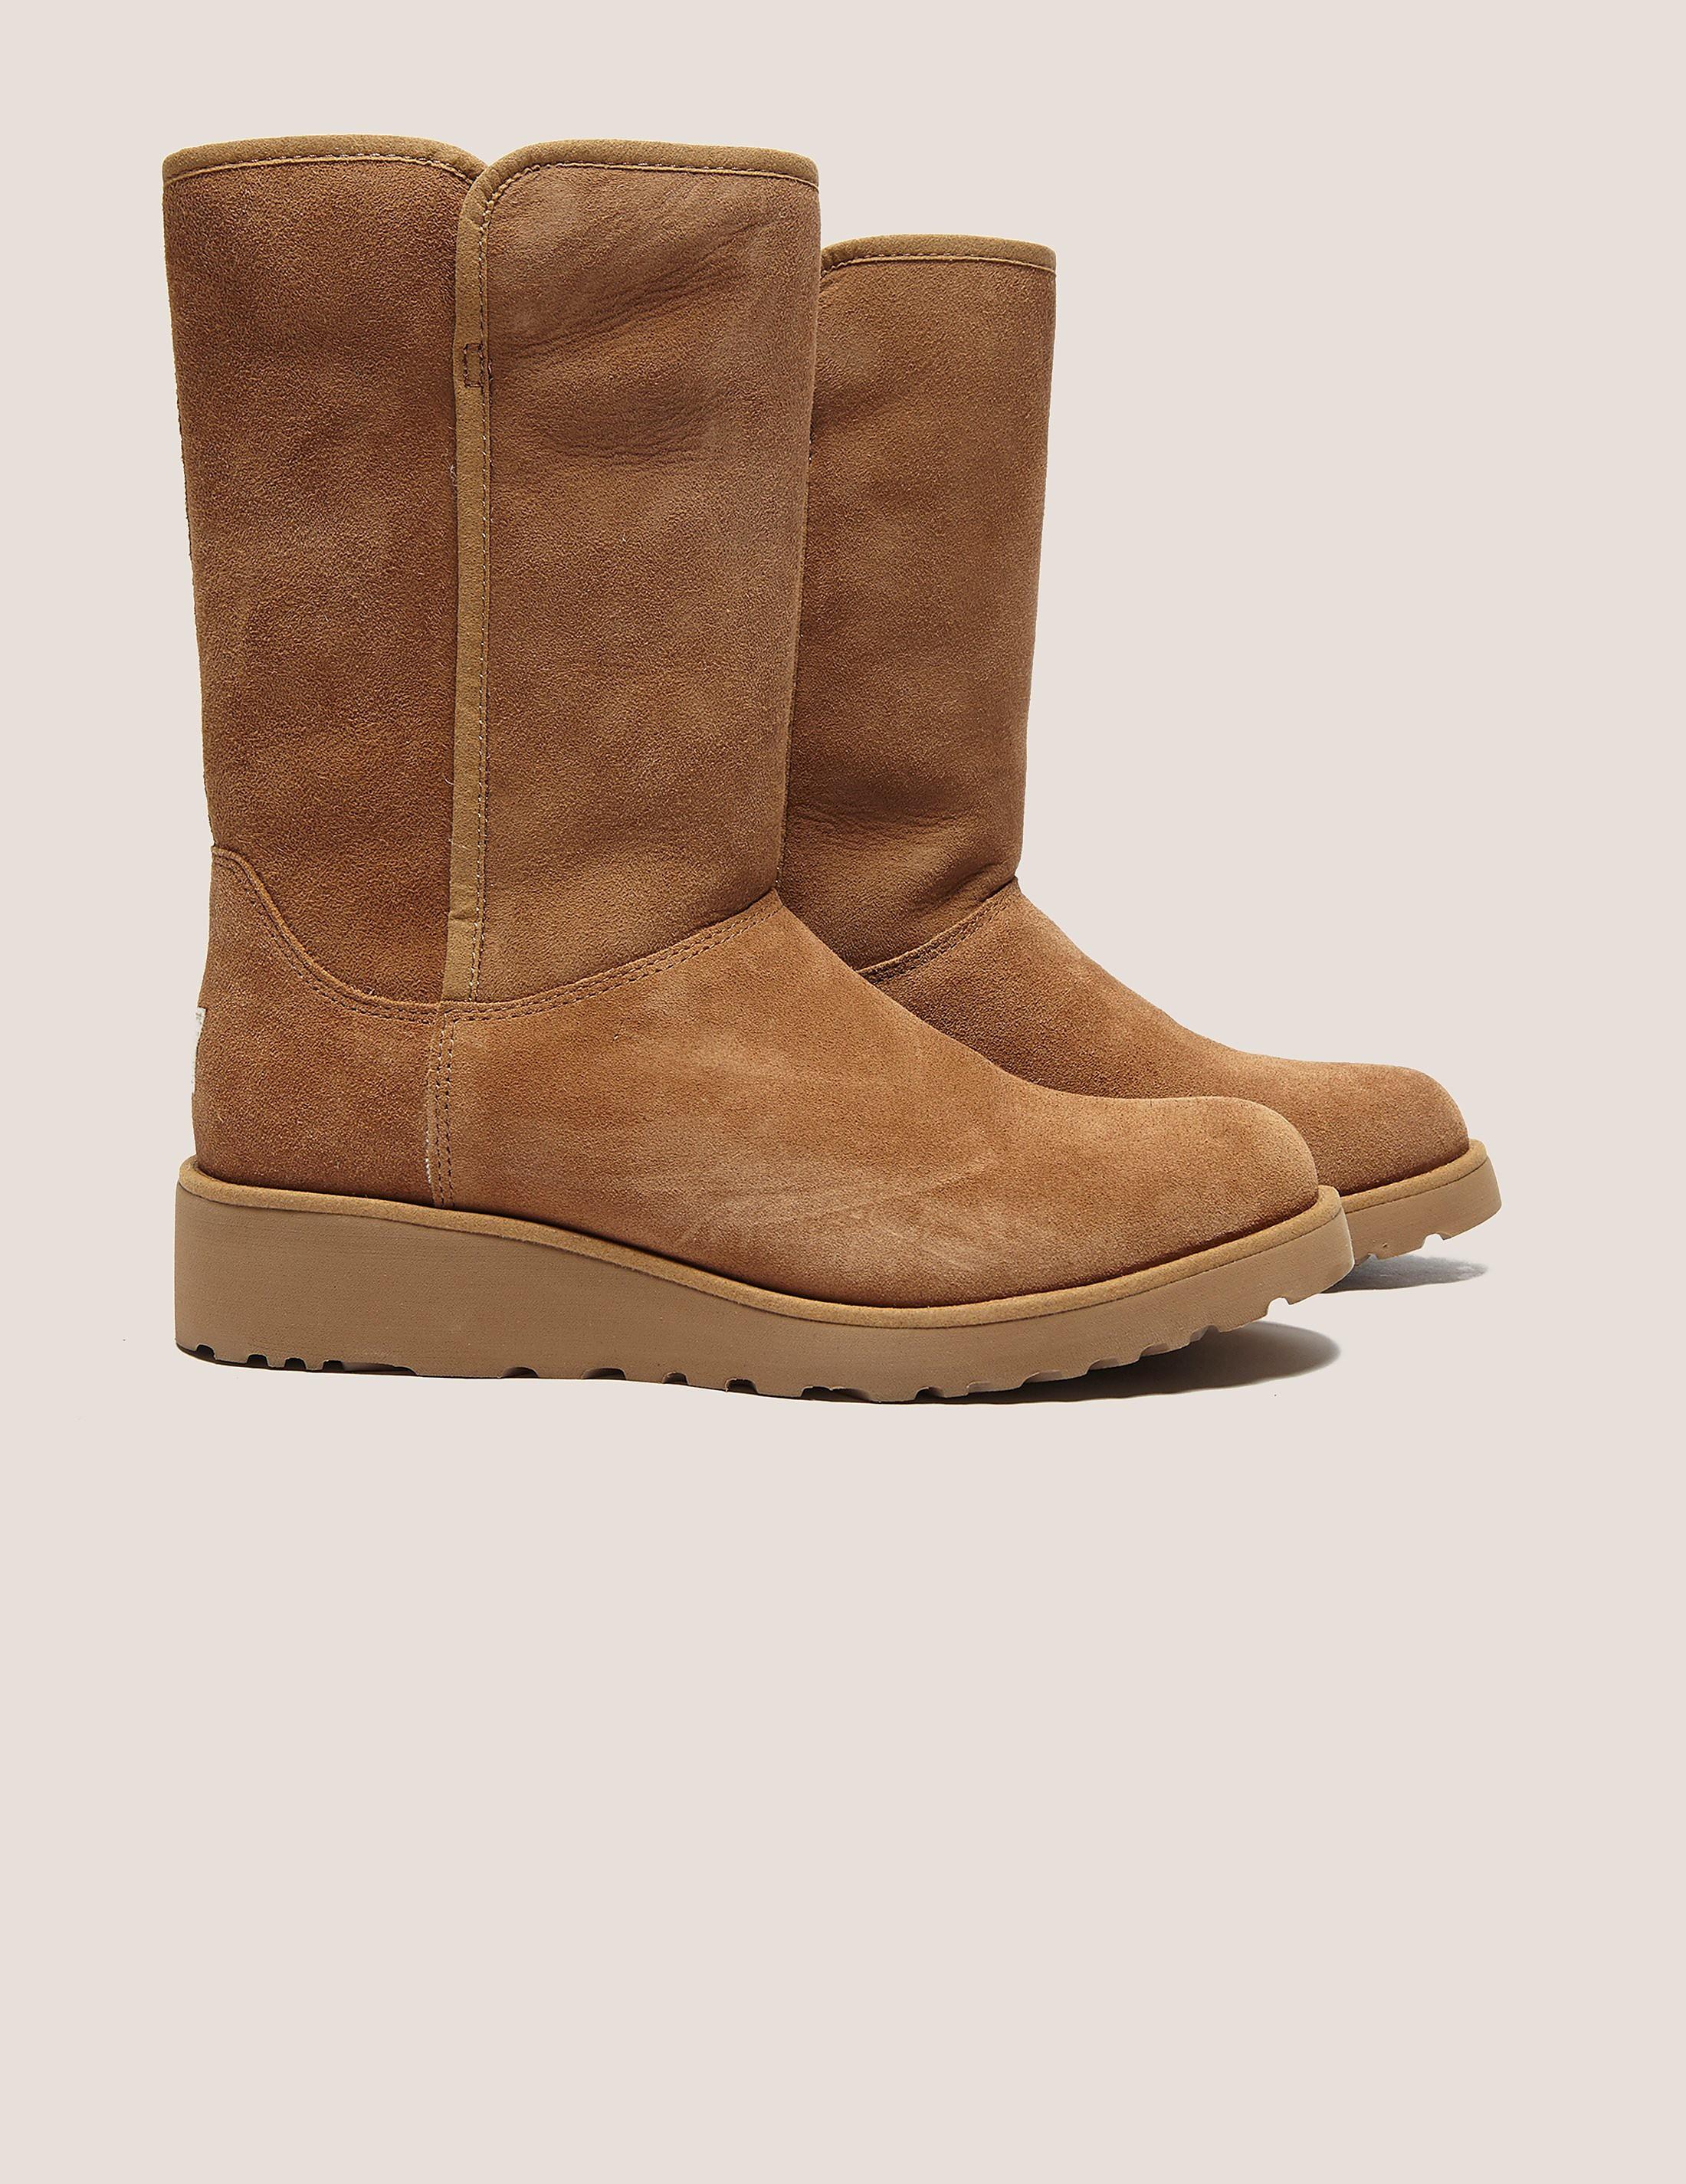 UGG Amie Short Wedge Boot